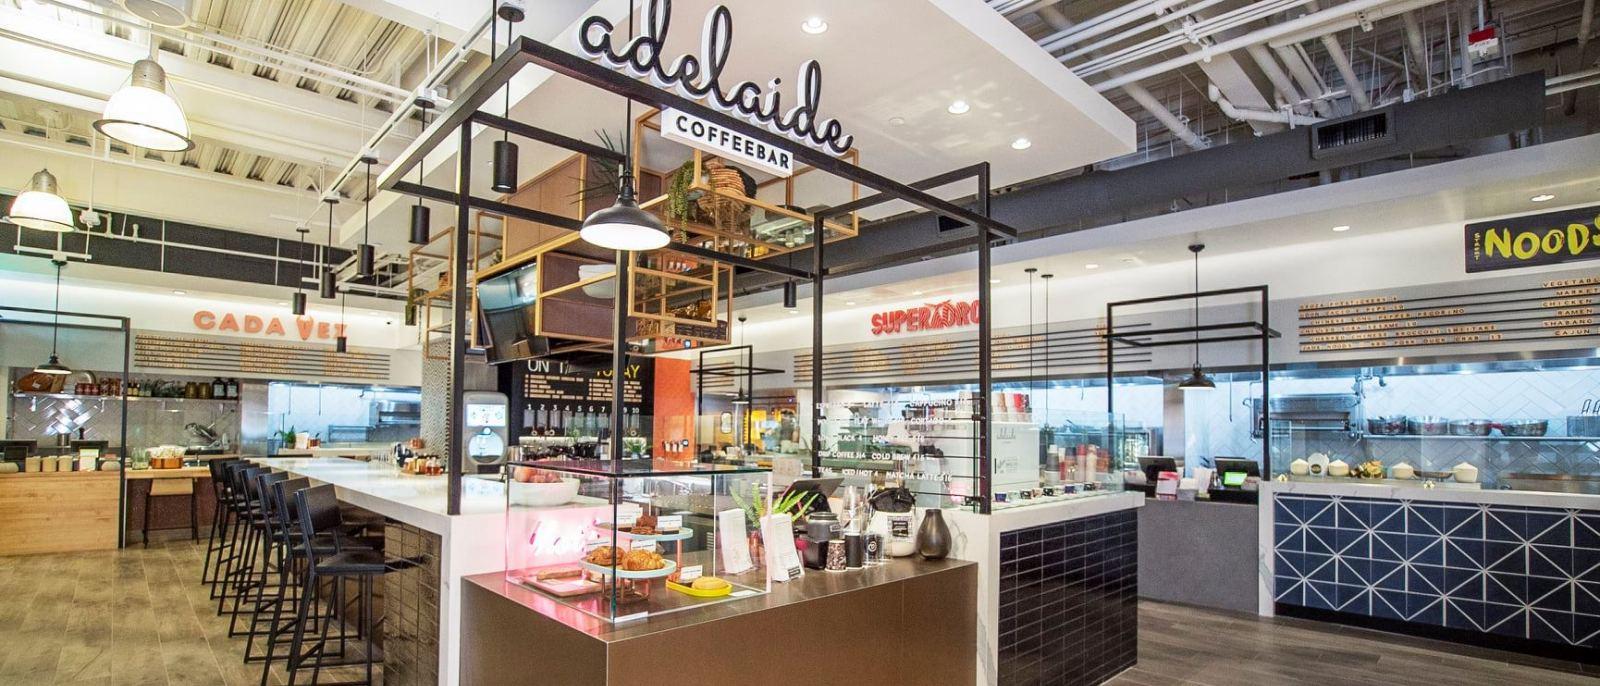 Adelaide Coffeebar at SOCIALEATS in Santa Monica